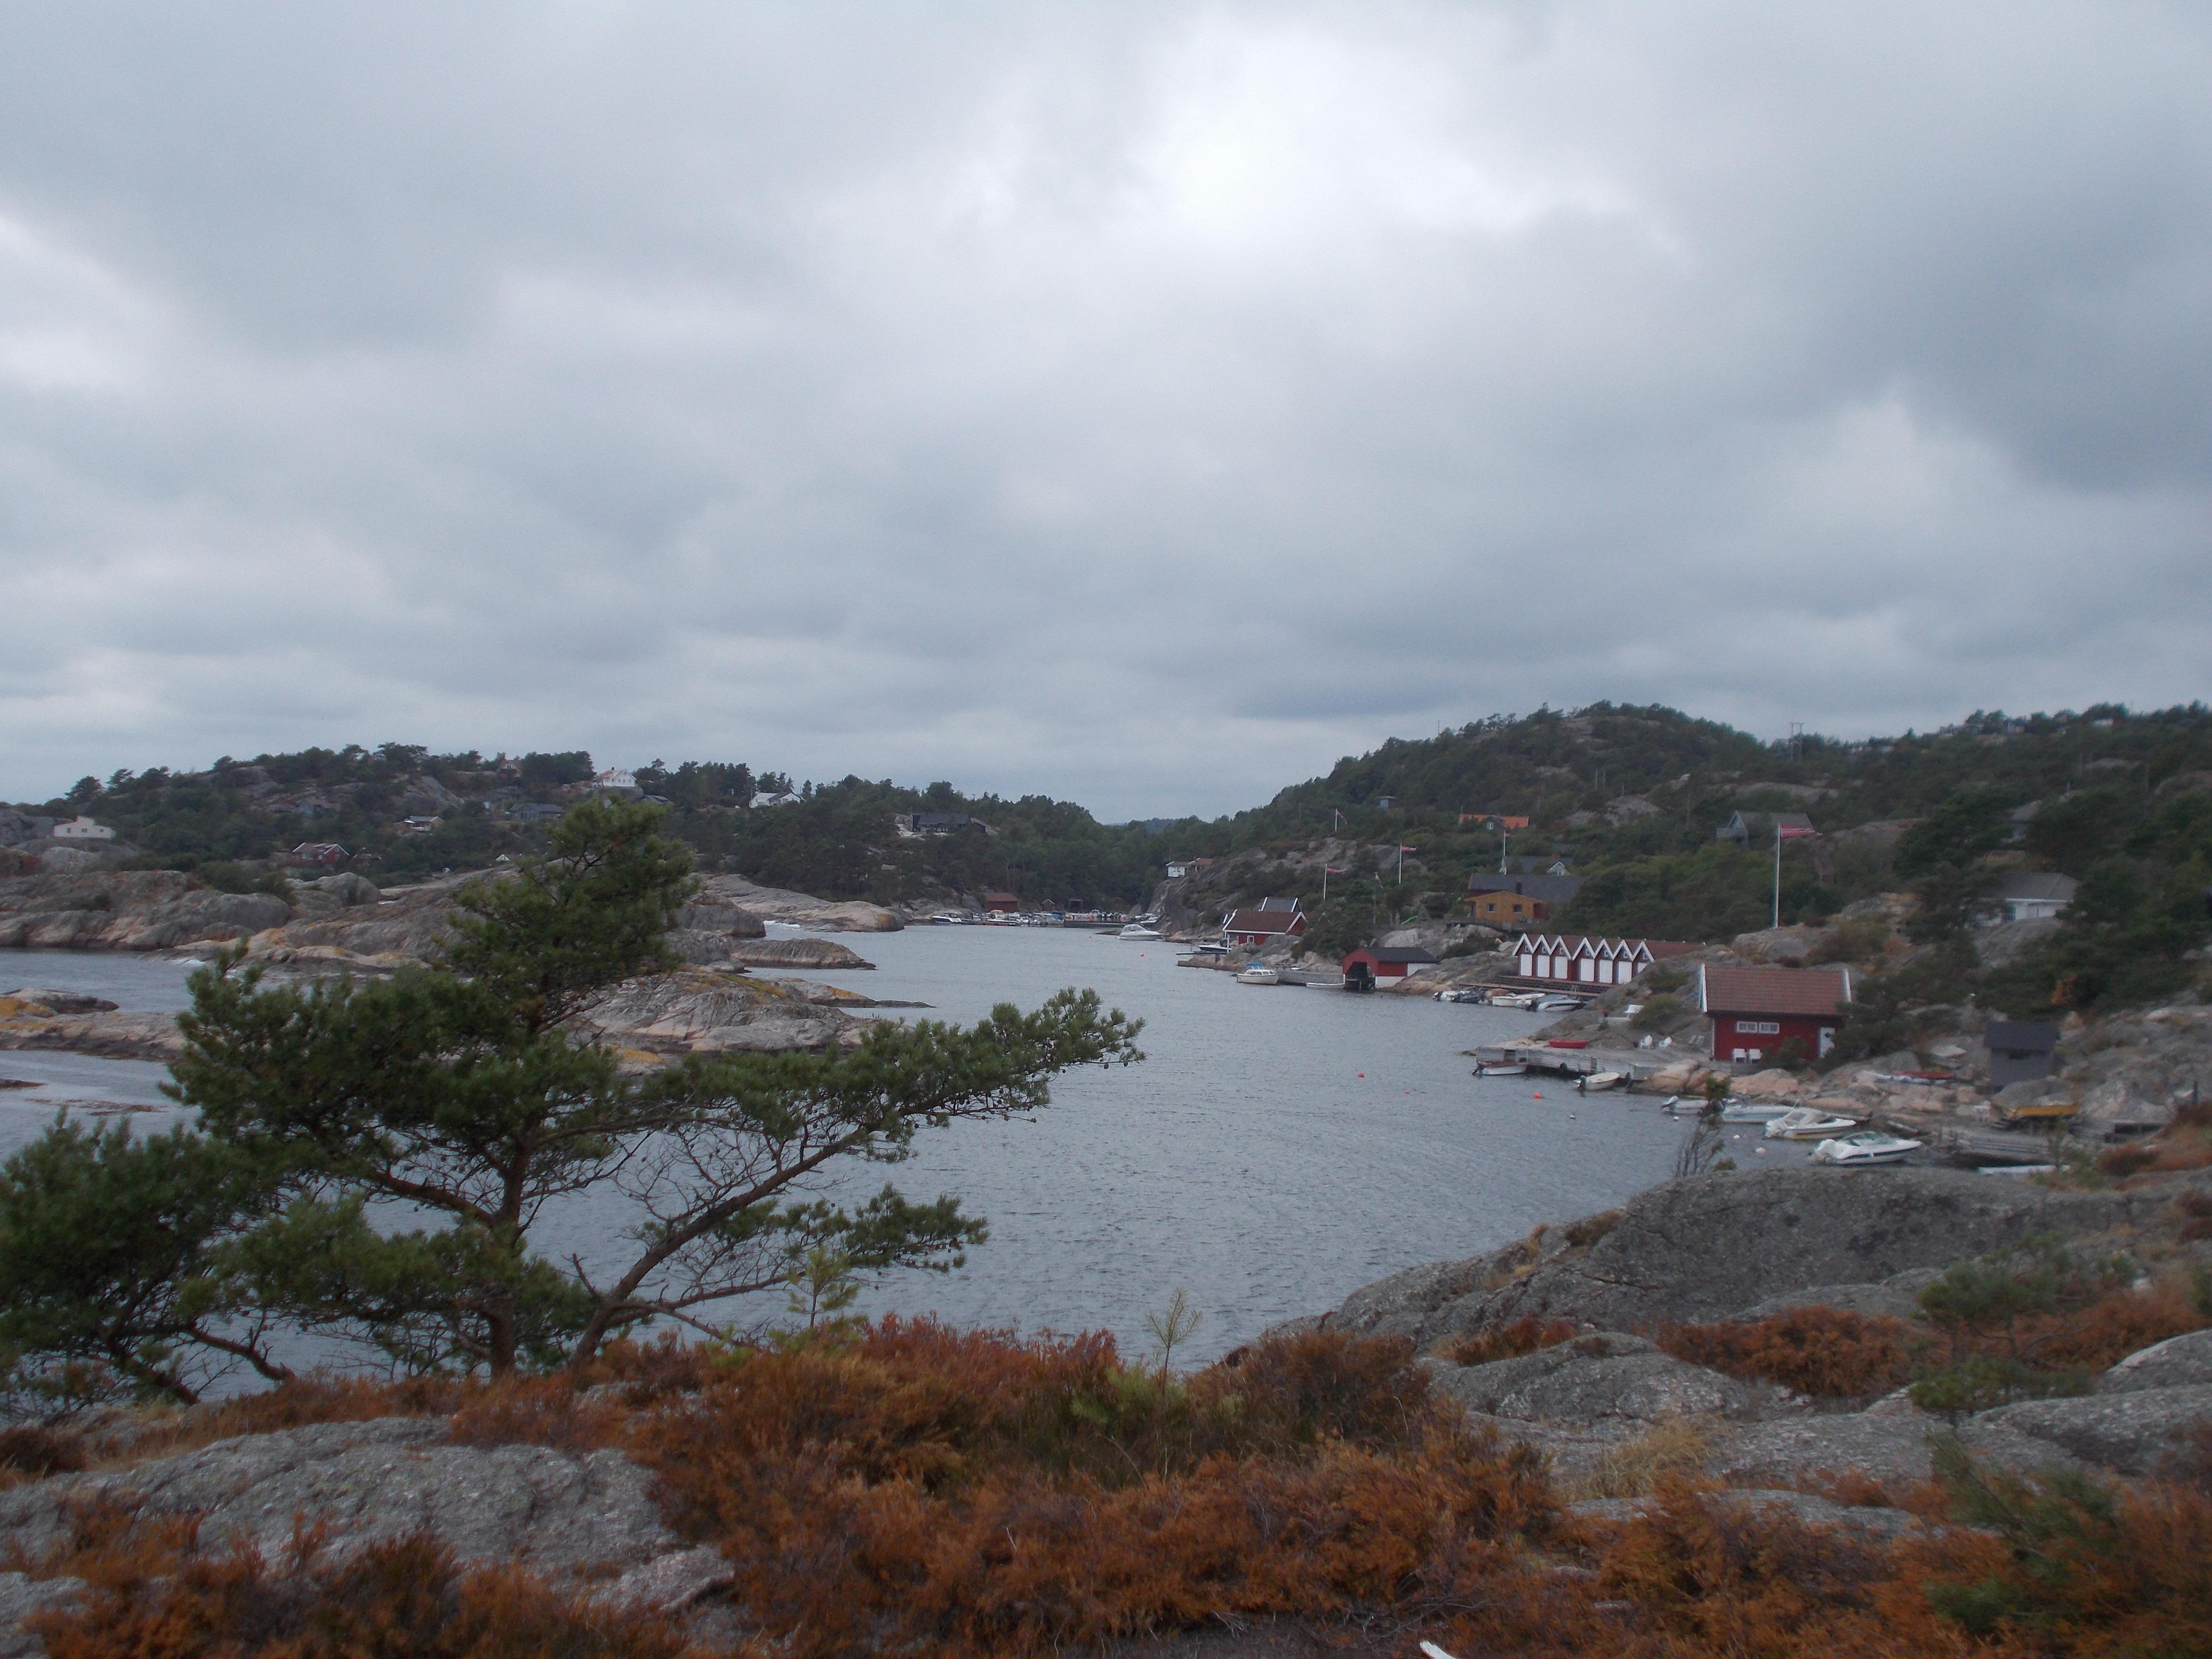 Kristiansand to Romsviga